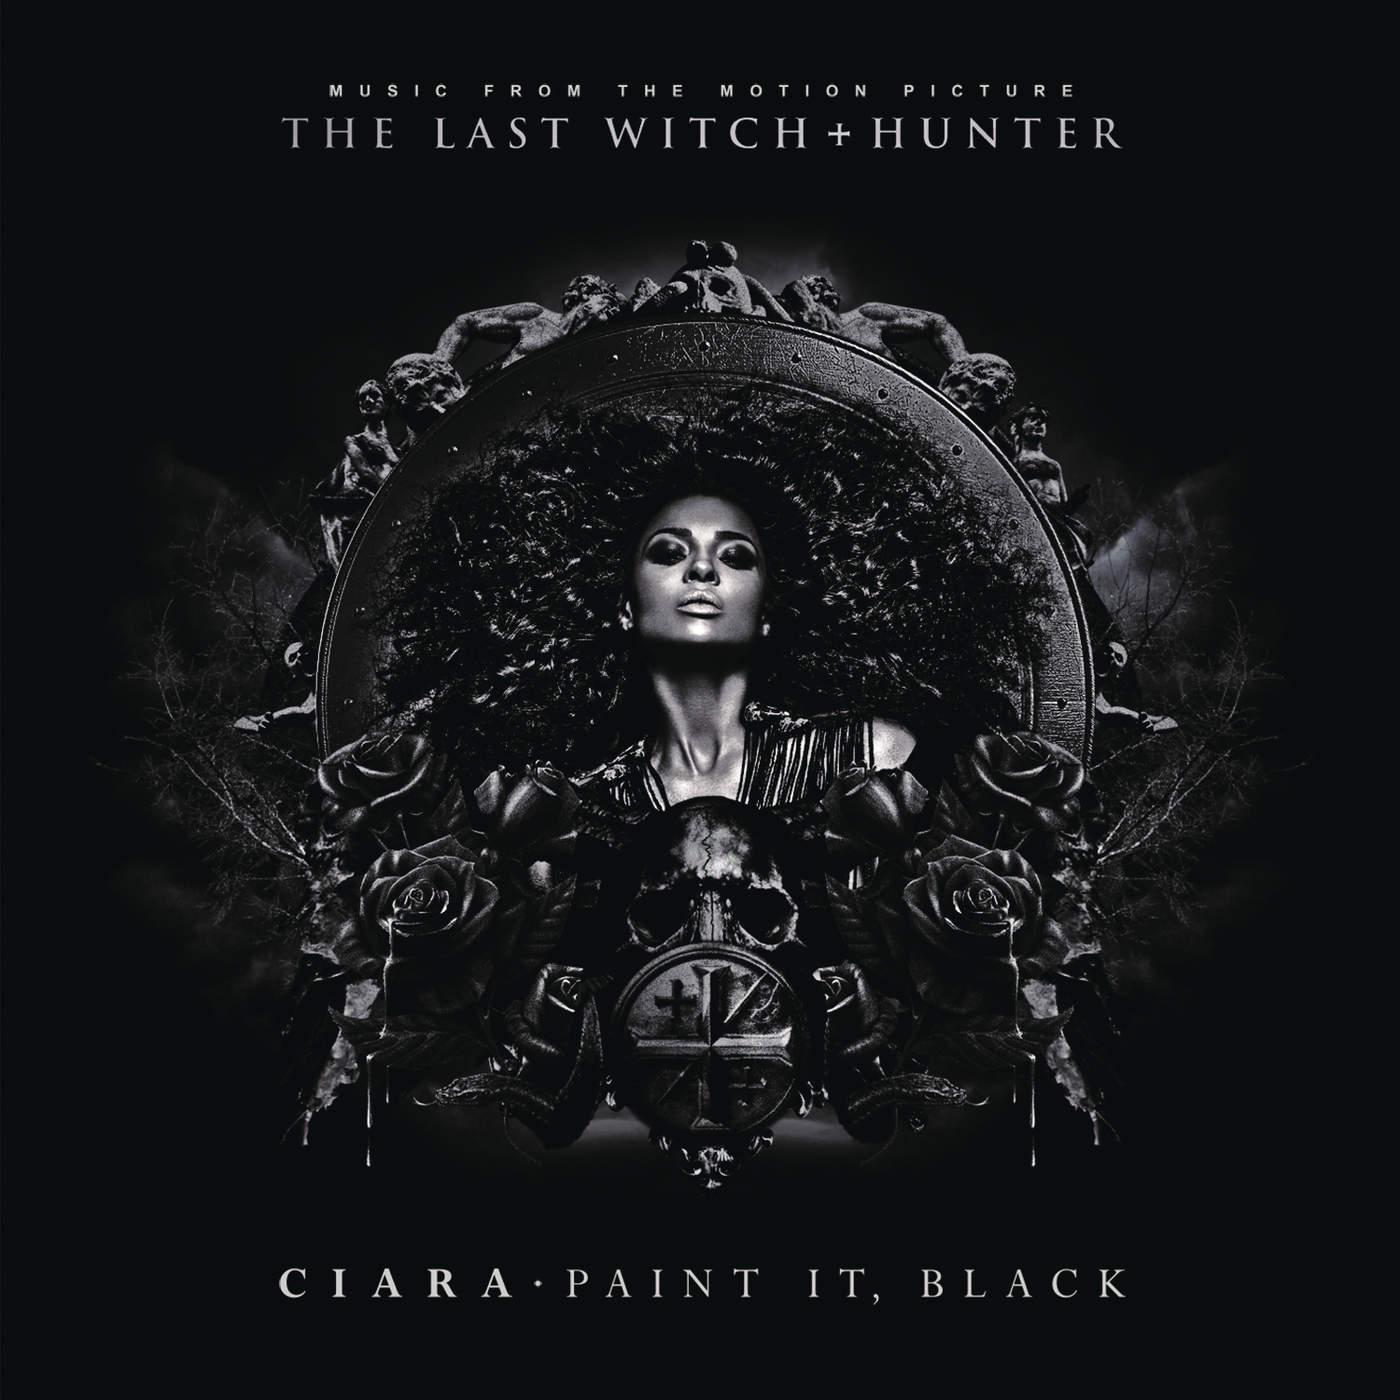 Ciara - Paint It, Black - Single Cover